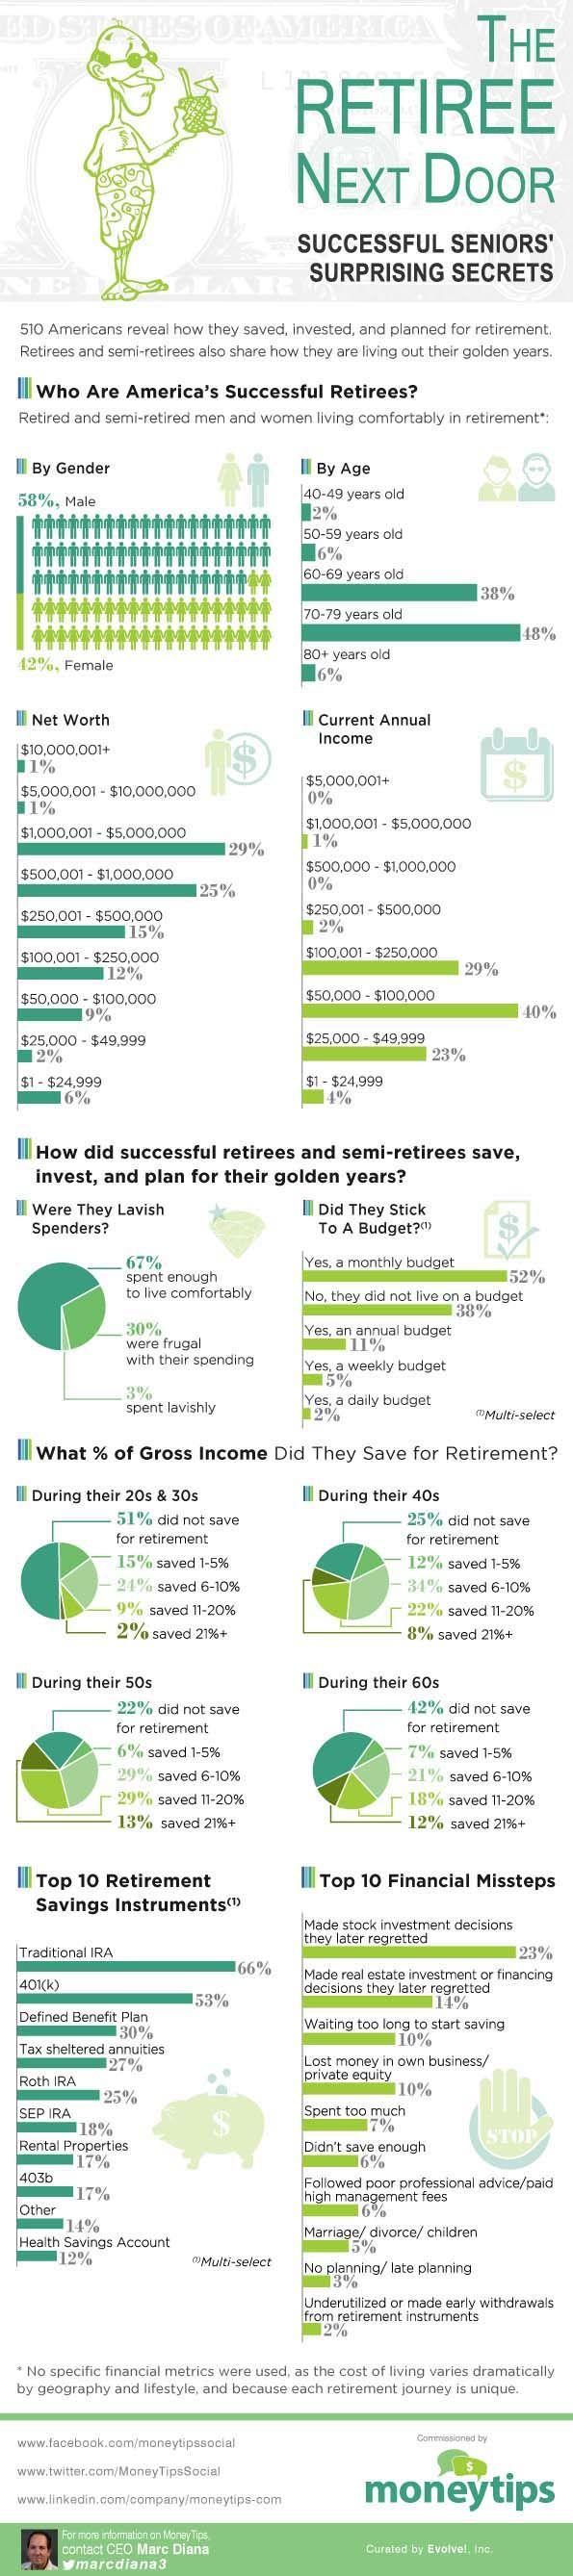 retirement-planning-mistakes | Worth Reading | Pinterest